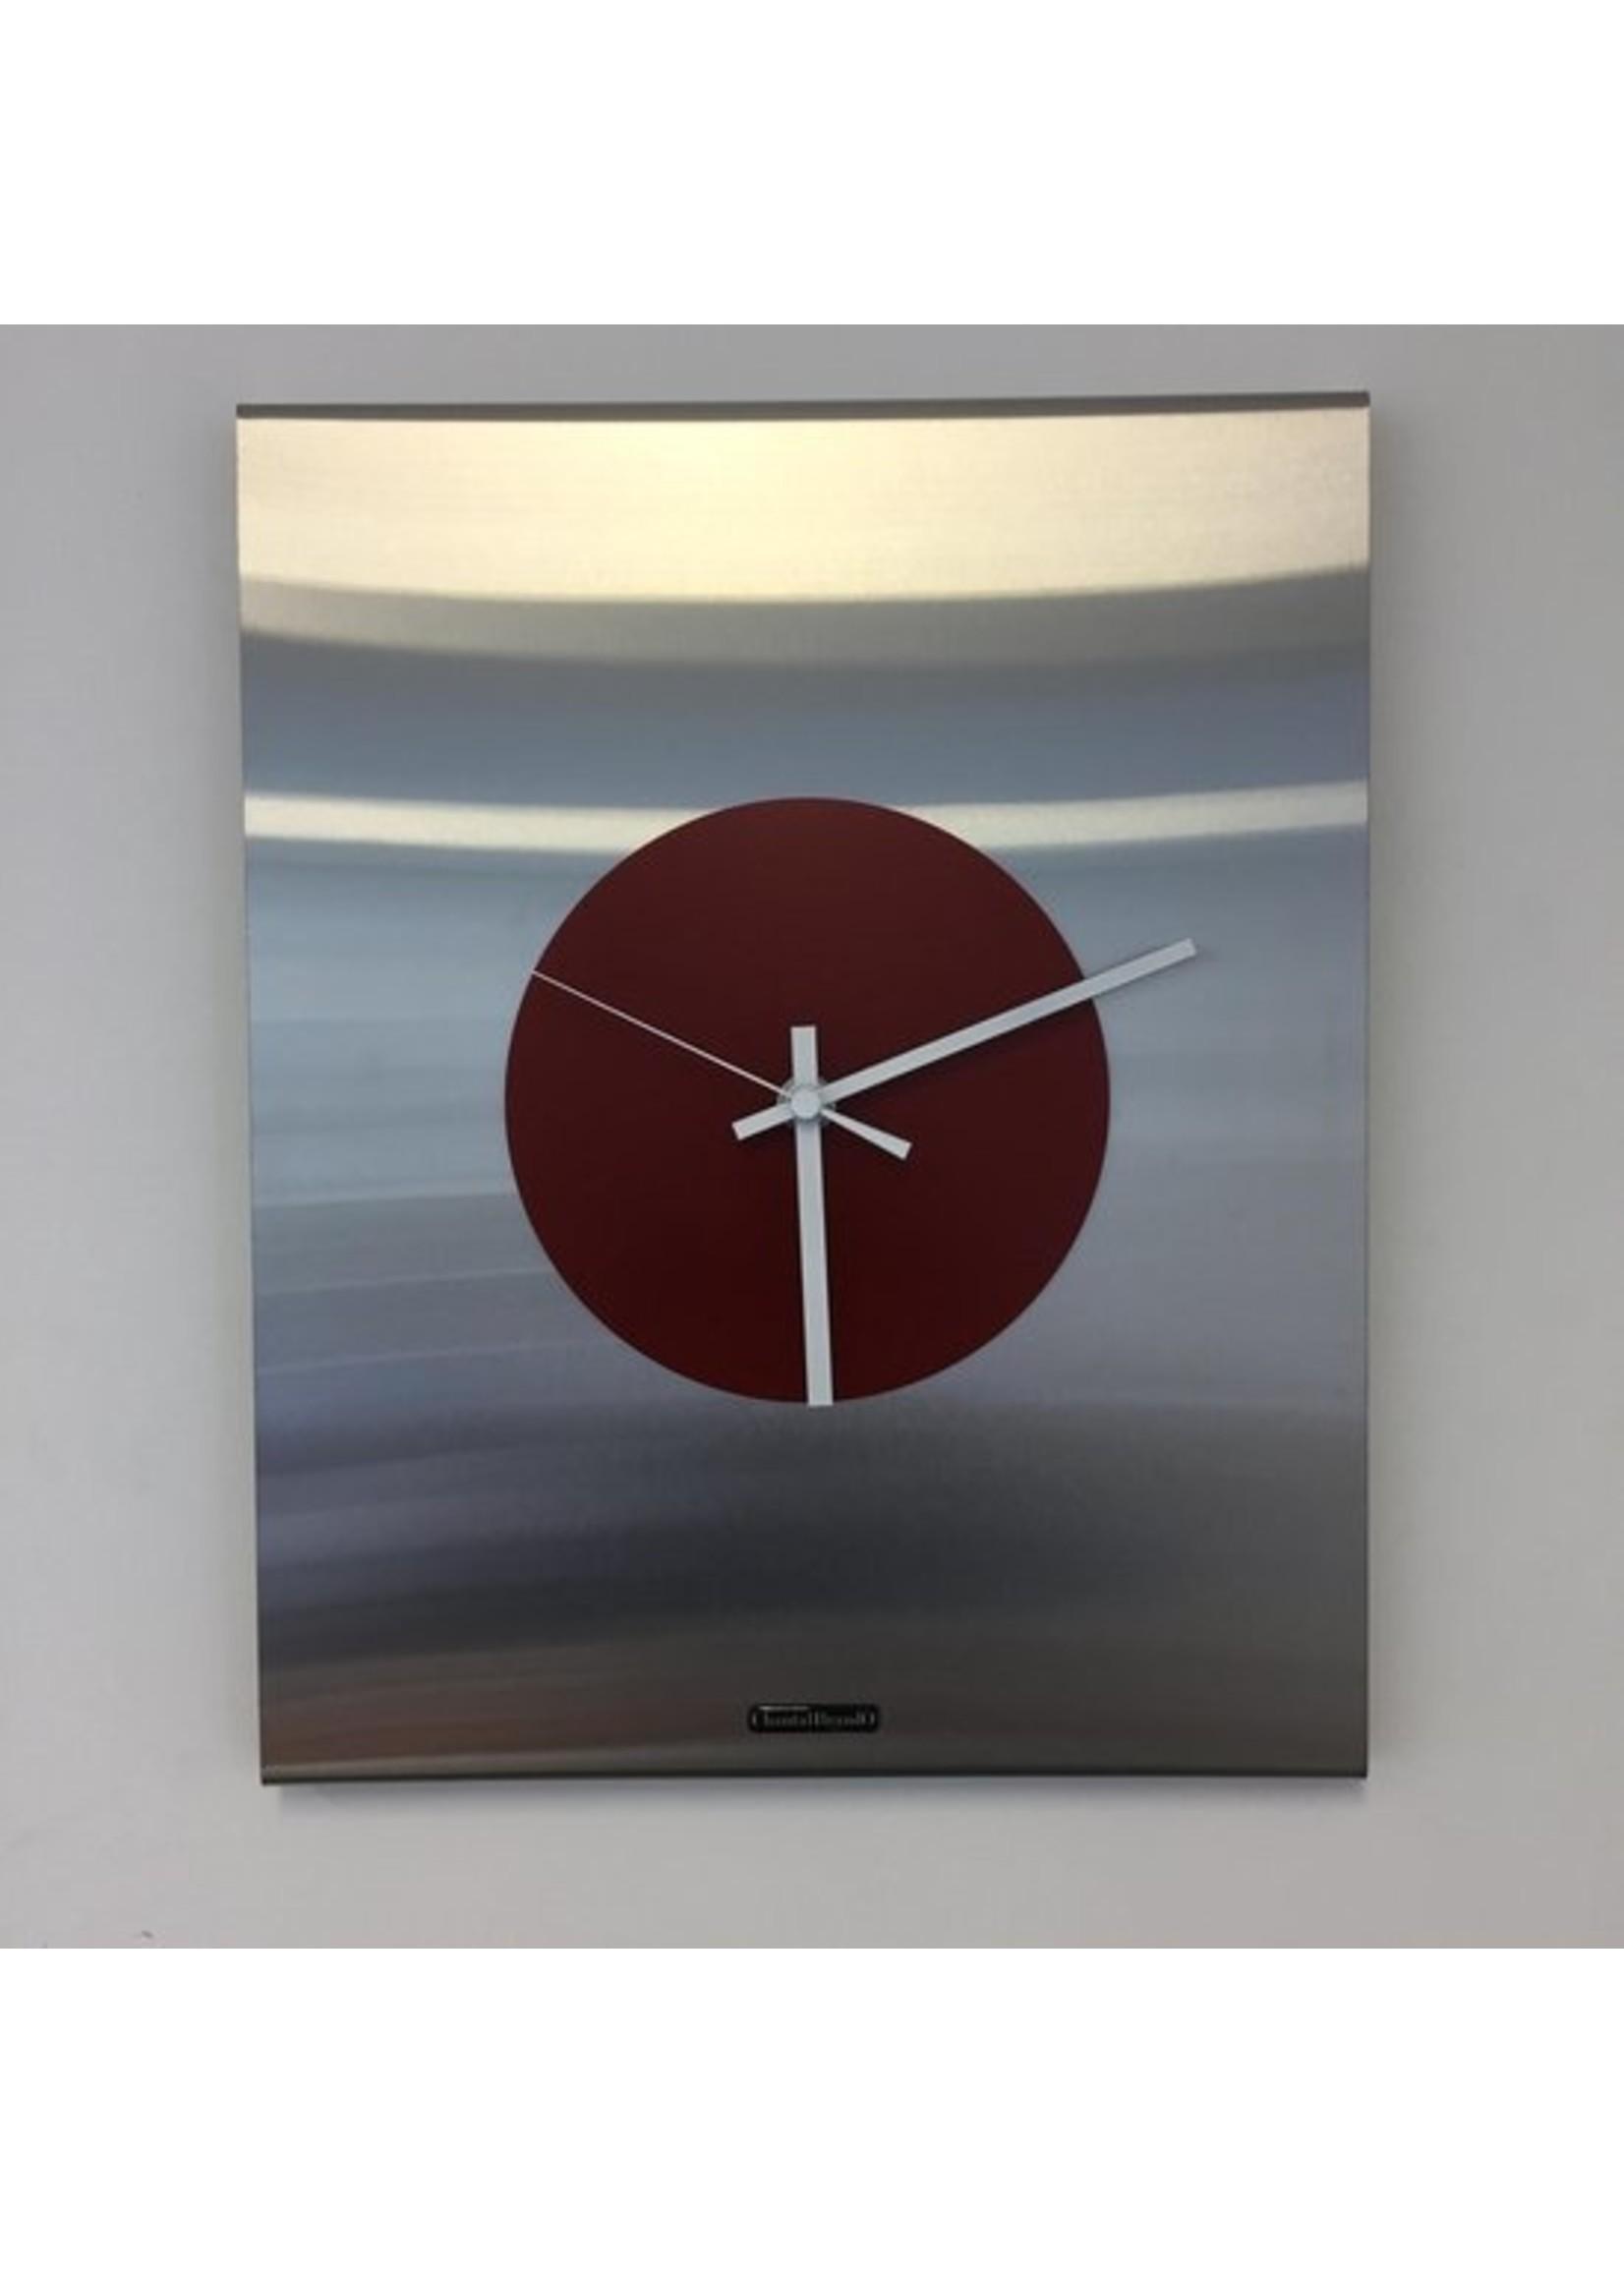 ChantalBrandO Wandklok Time Square RED Modern Design